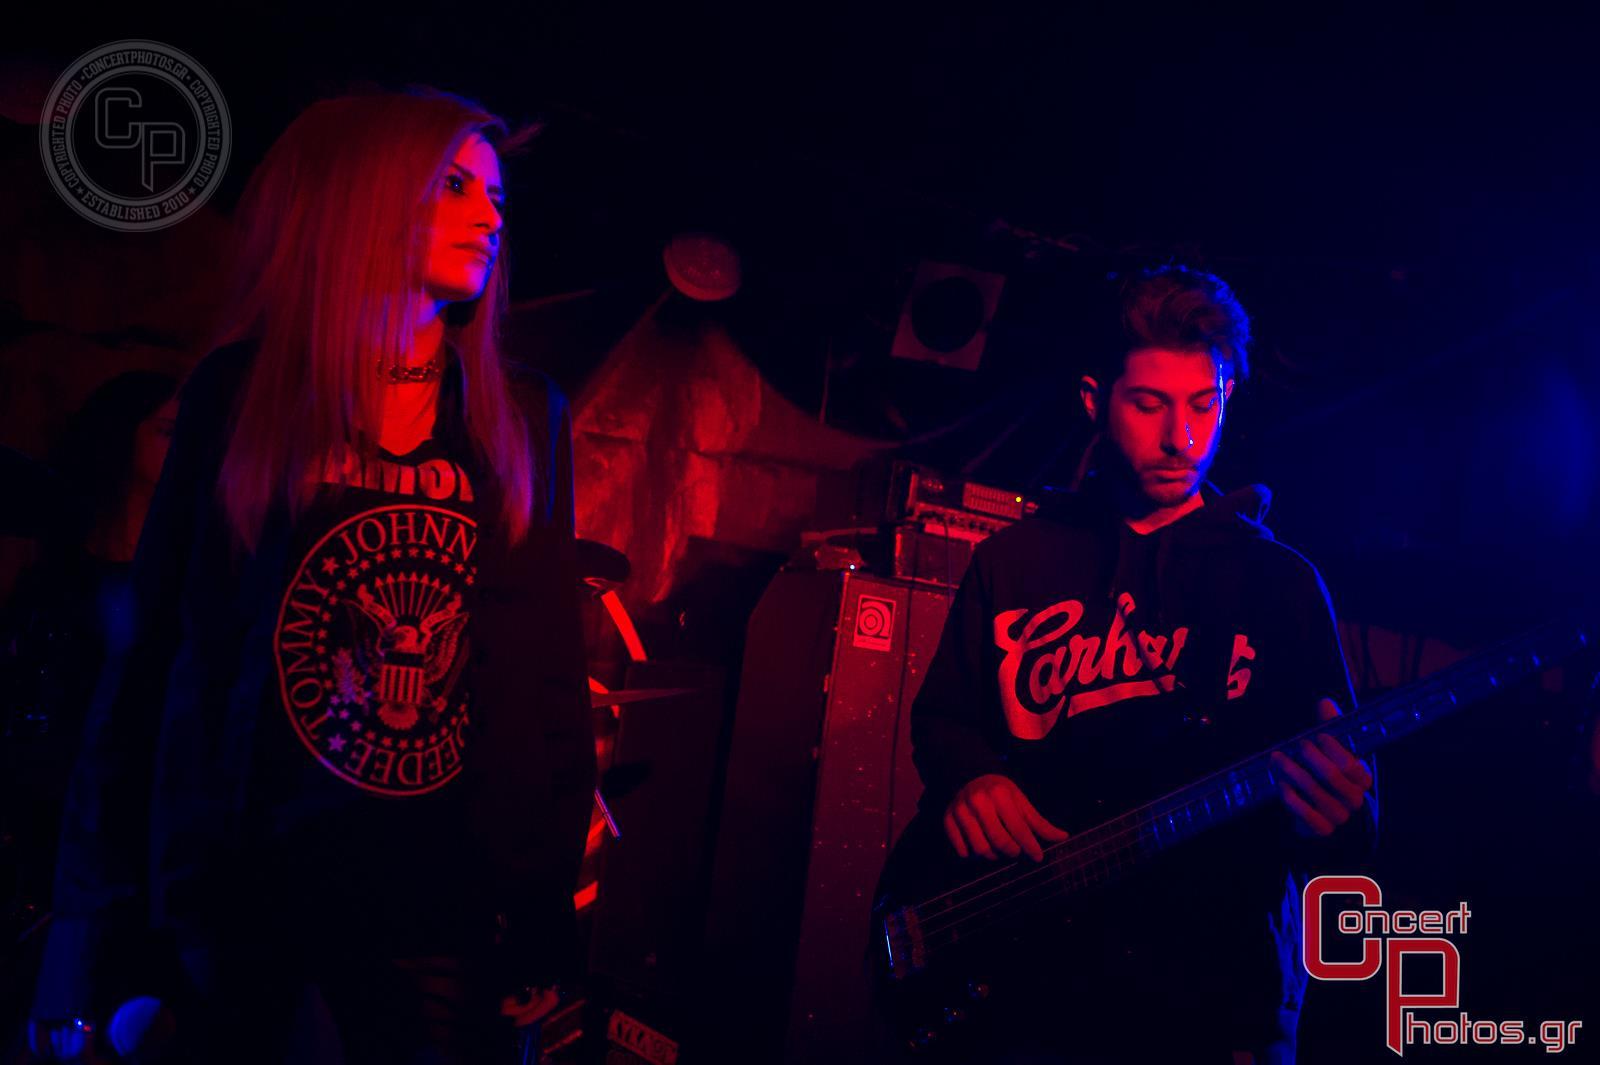 Battle Of The Bands Leg 1-Battle Of The Bands Leg 1 photographer:  - ConcertPhotos - 20141126_2359_31